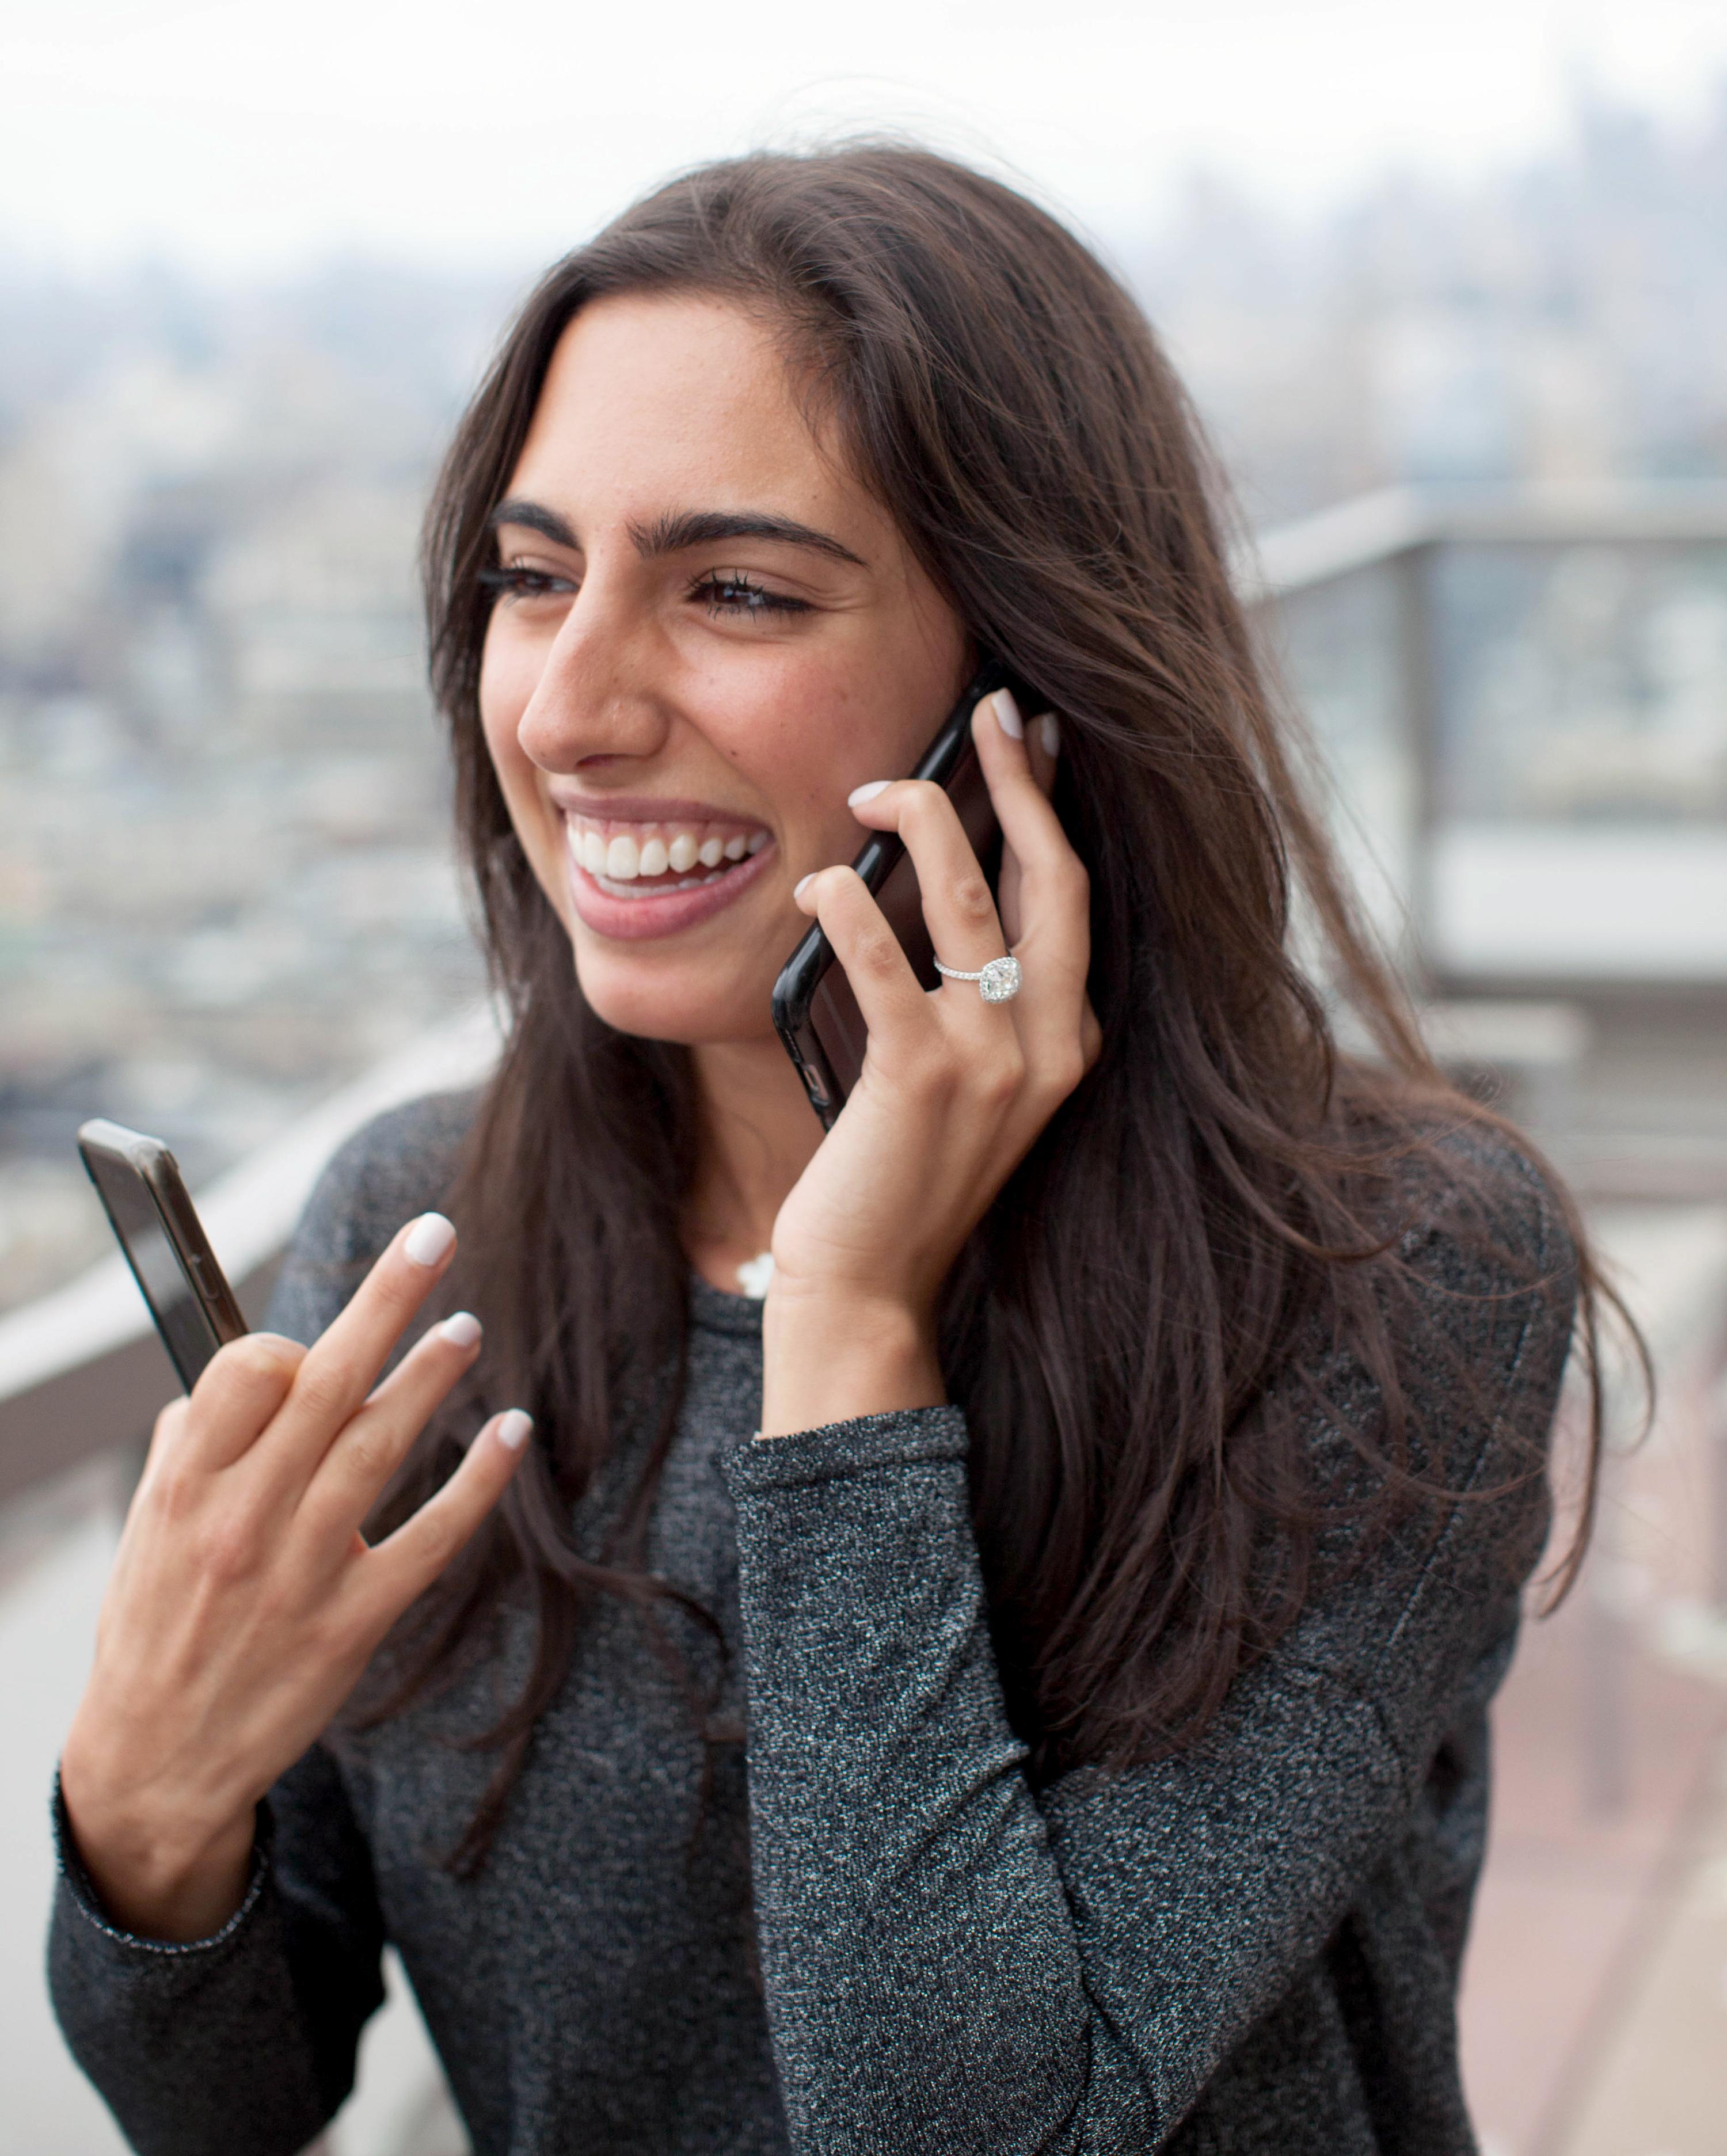 lea-joseph-proposal-phone-1067-s112360-0915.jpg